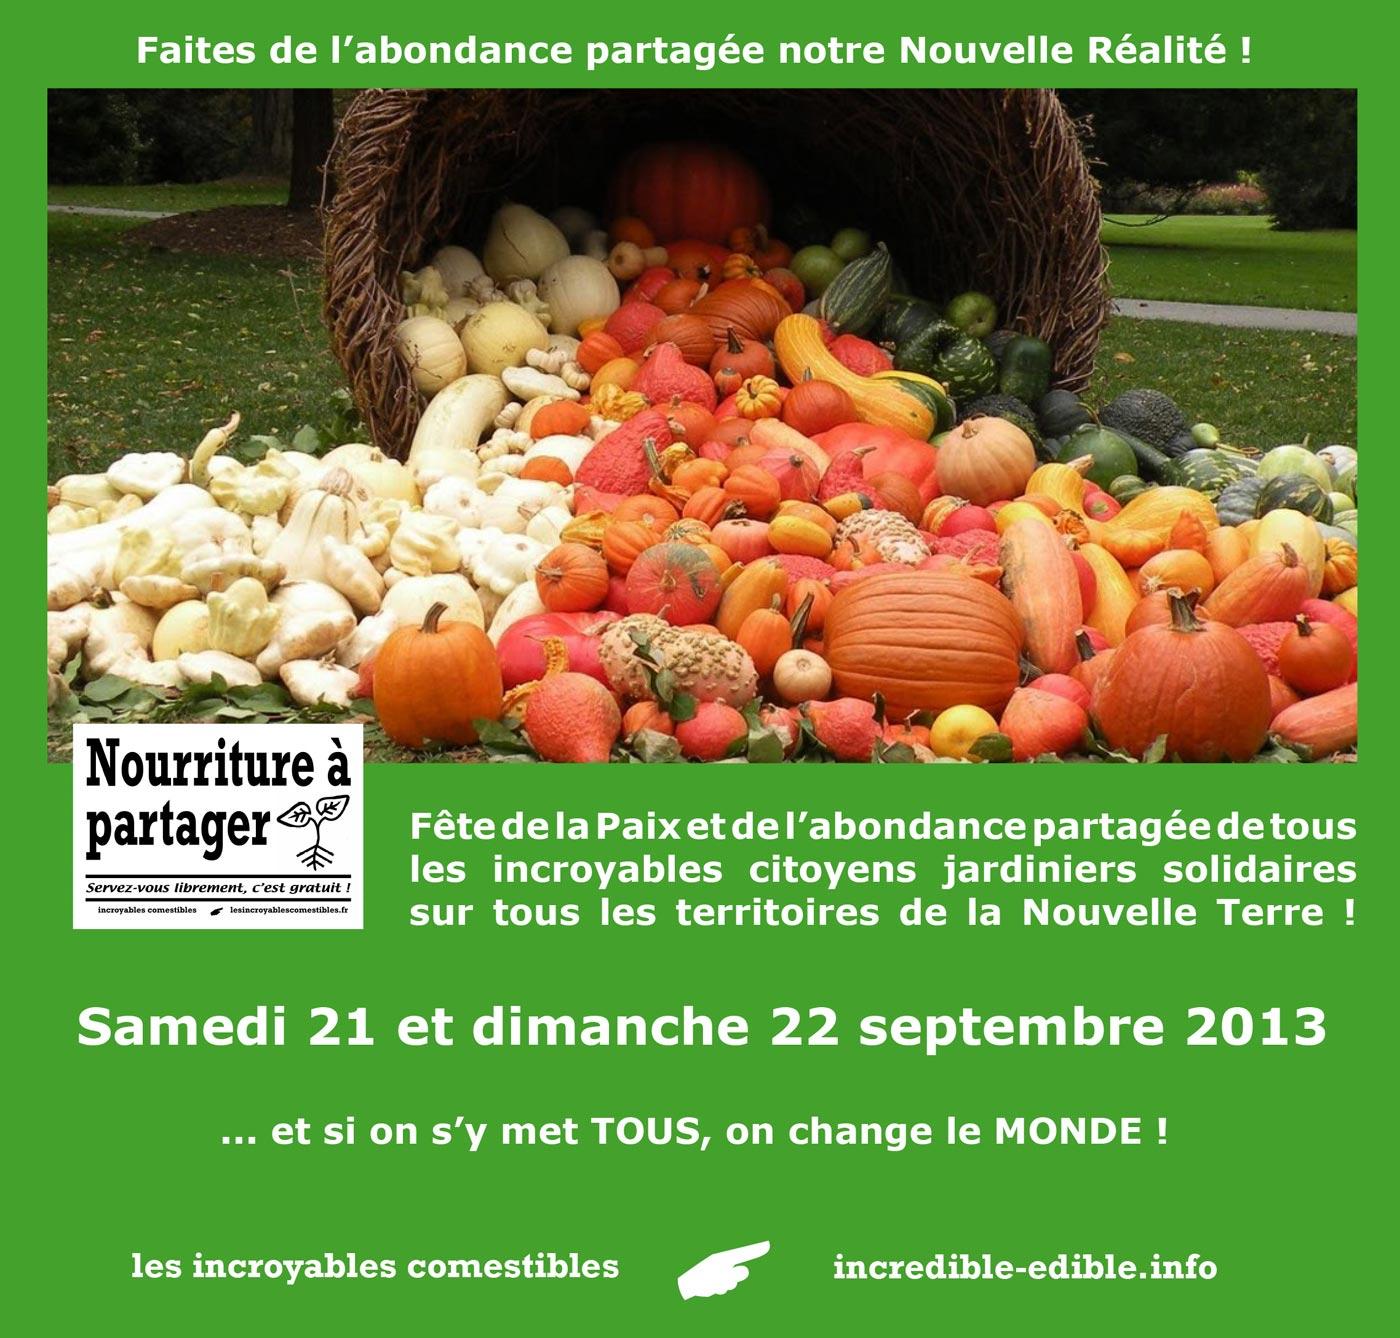 c520_incredible_edible_todmorden_france_fete-de-la-paix_21-septembre-2013_incroyables_comestibles_w1400